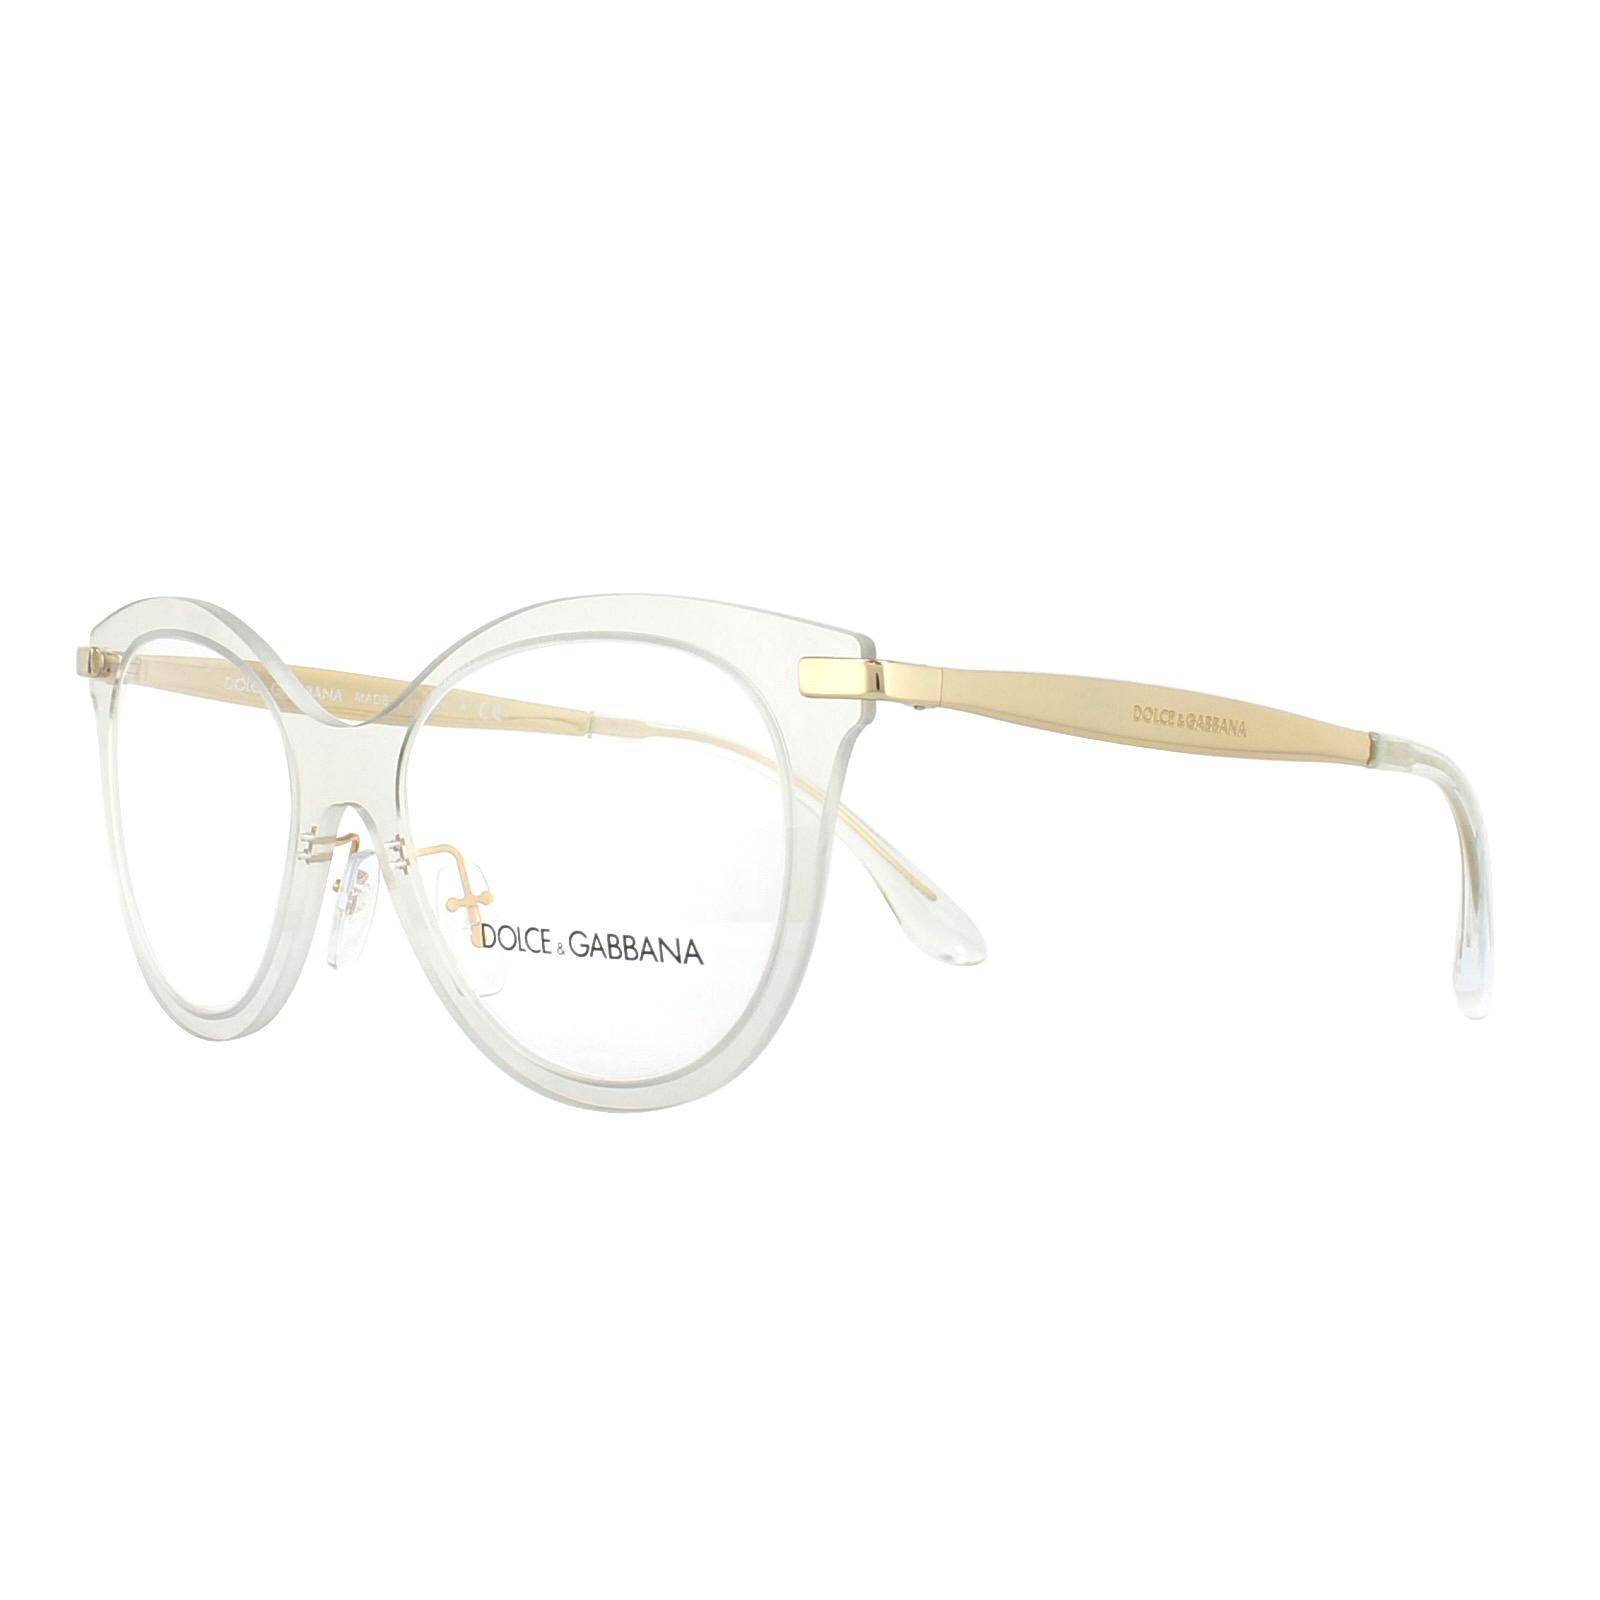 bfee2ae4ef Sentinel Dolce   Gabbana Glasses Frames DG 1292 3073 Clear 51mm Womens